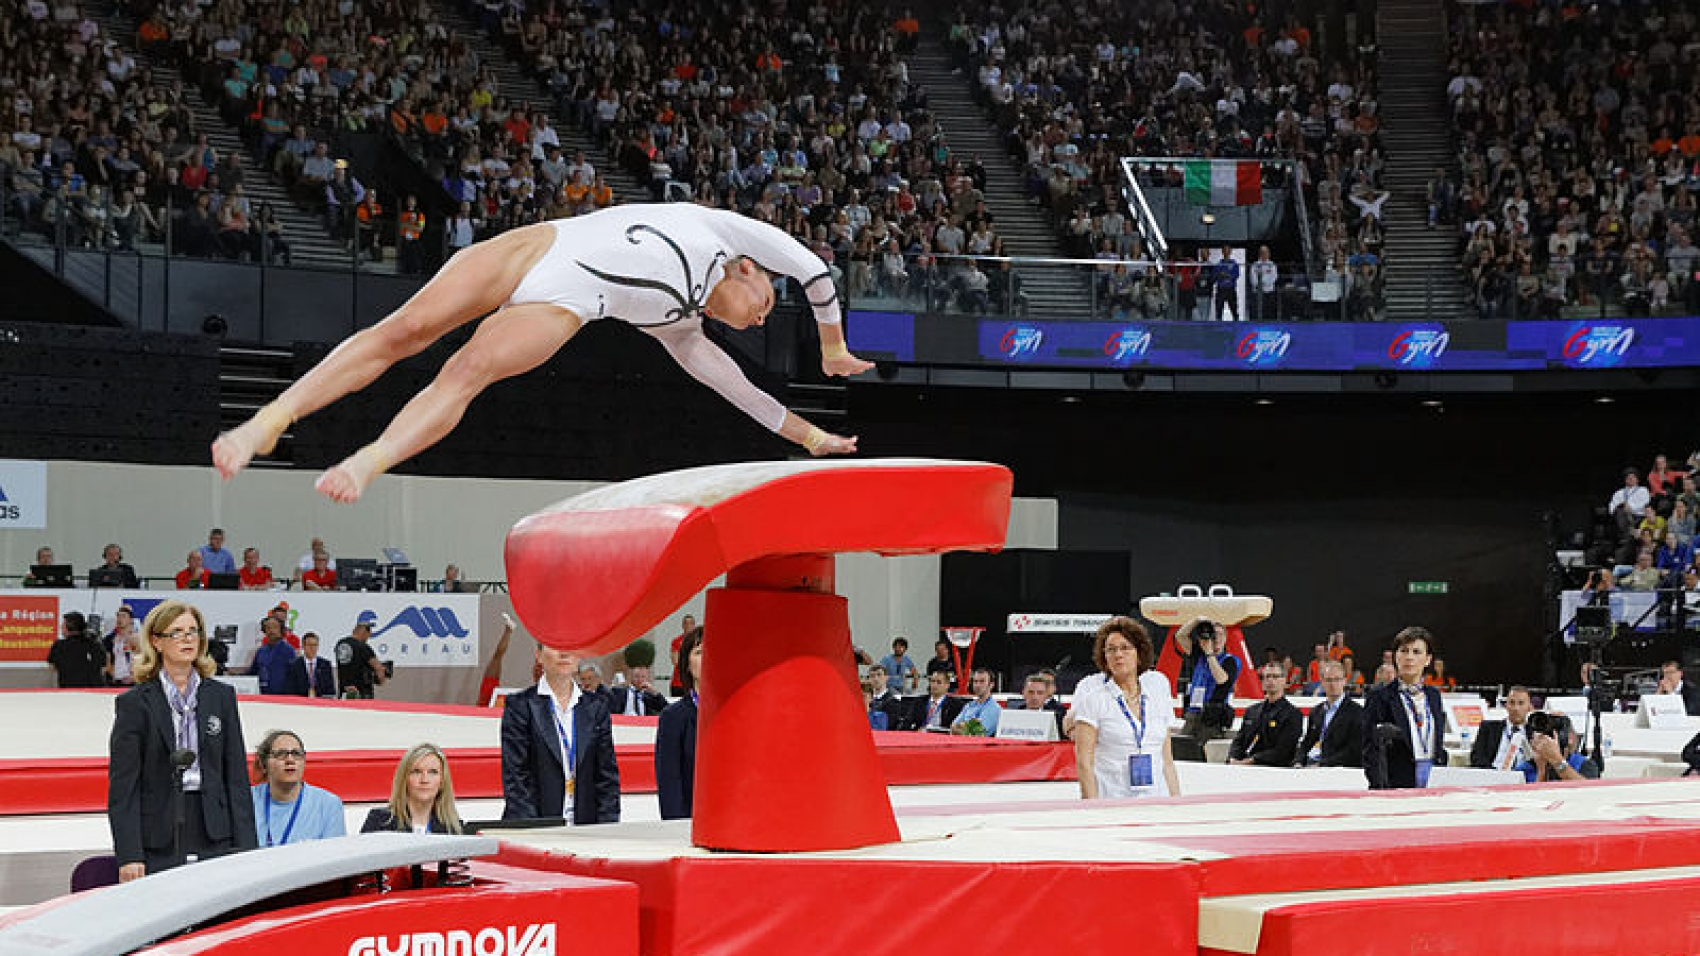 2015_European_Artistic_Gymnastics_Championships_-_Vault_-_Maria_Paseka_03